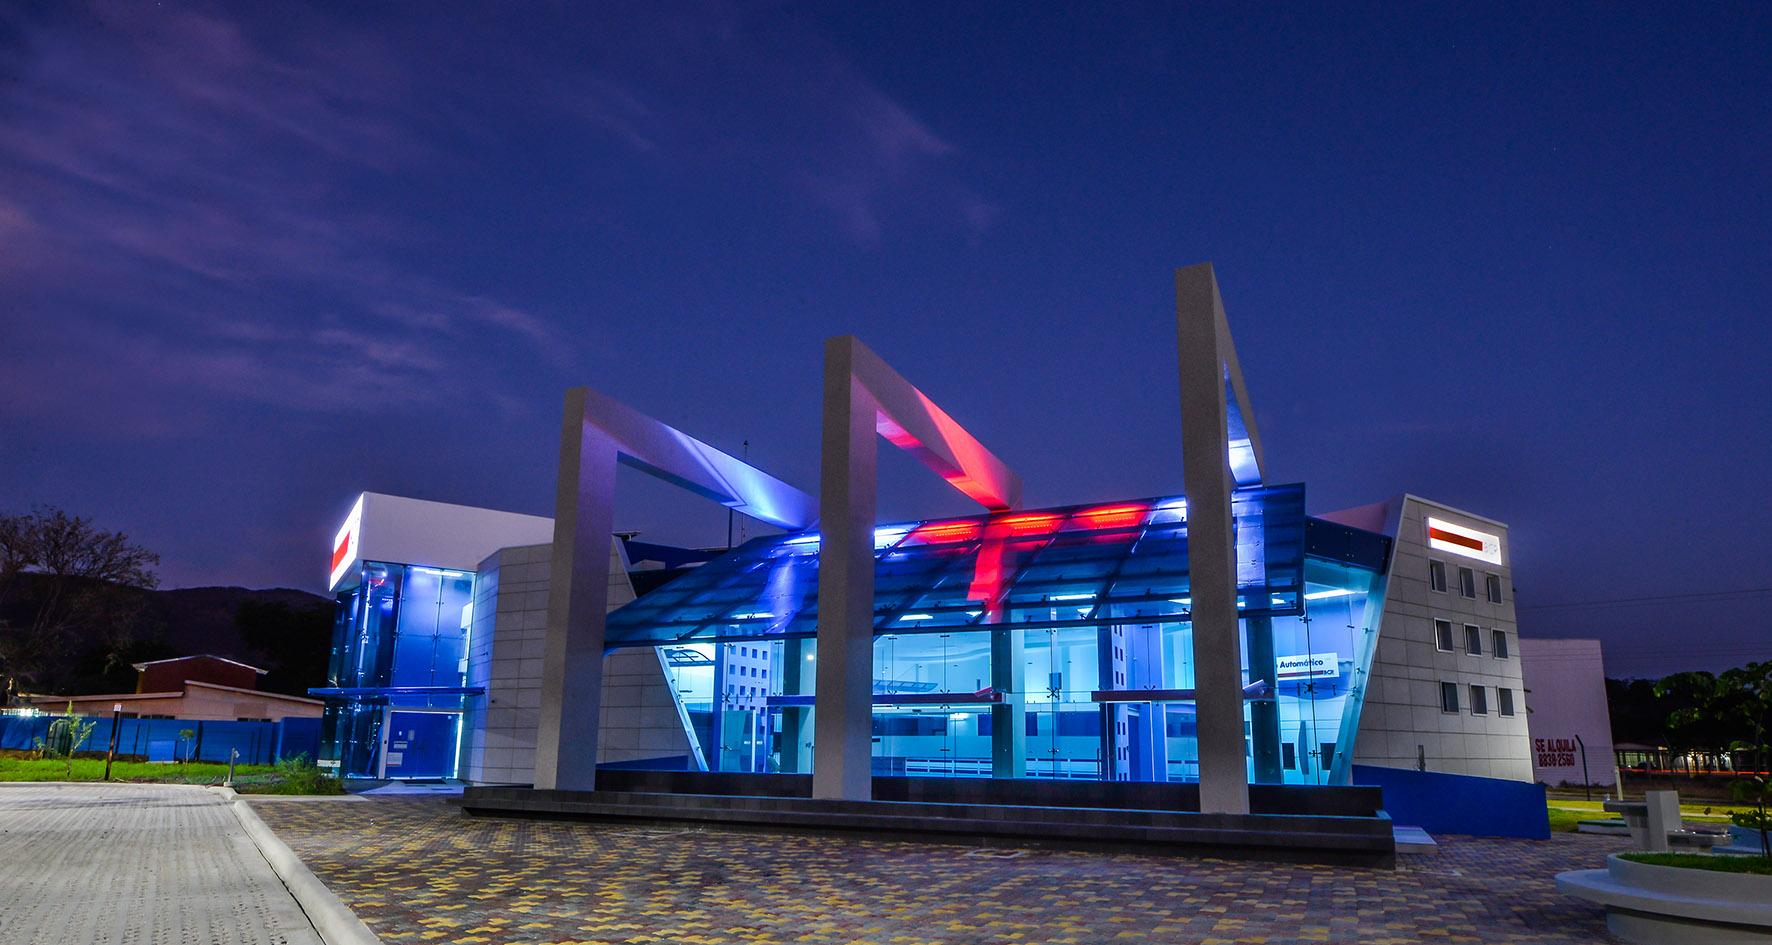 BCR Nicoya - Guanacaste, Costa RicaLEED NC - v2009 - LEED Platino1.480 m2